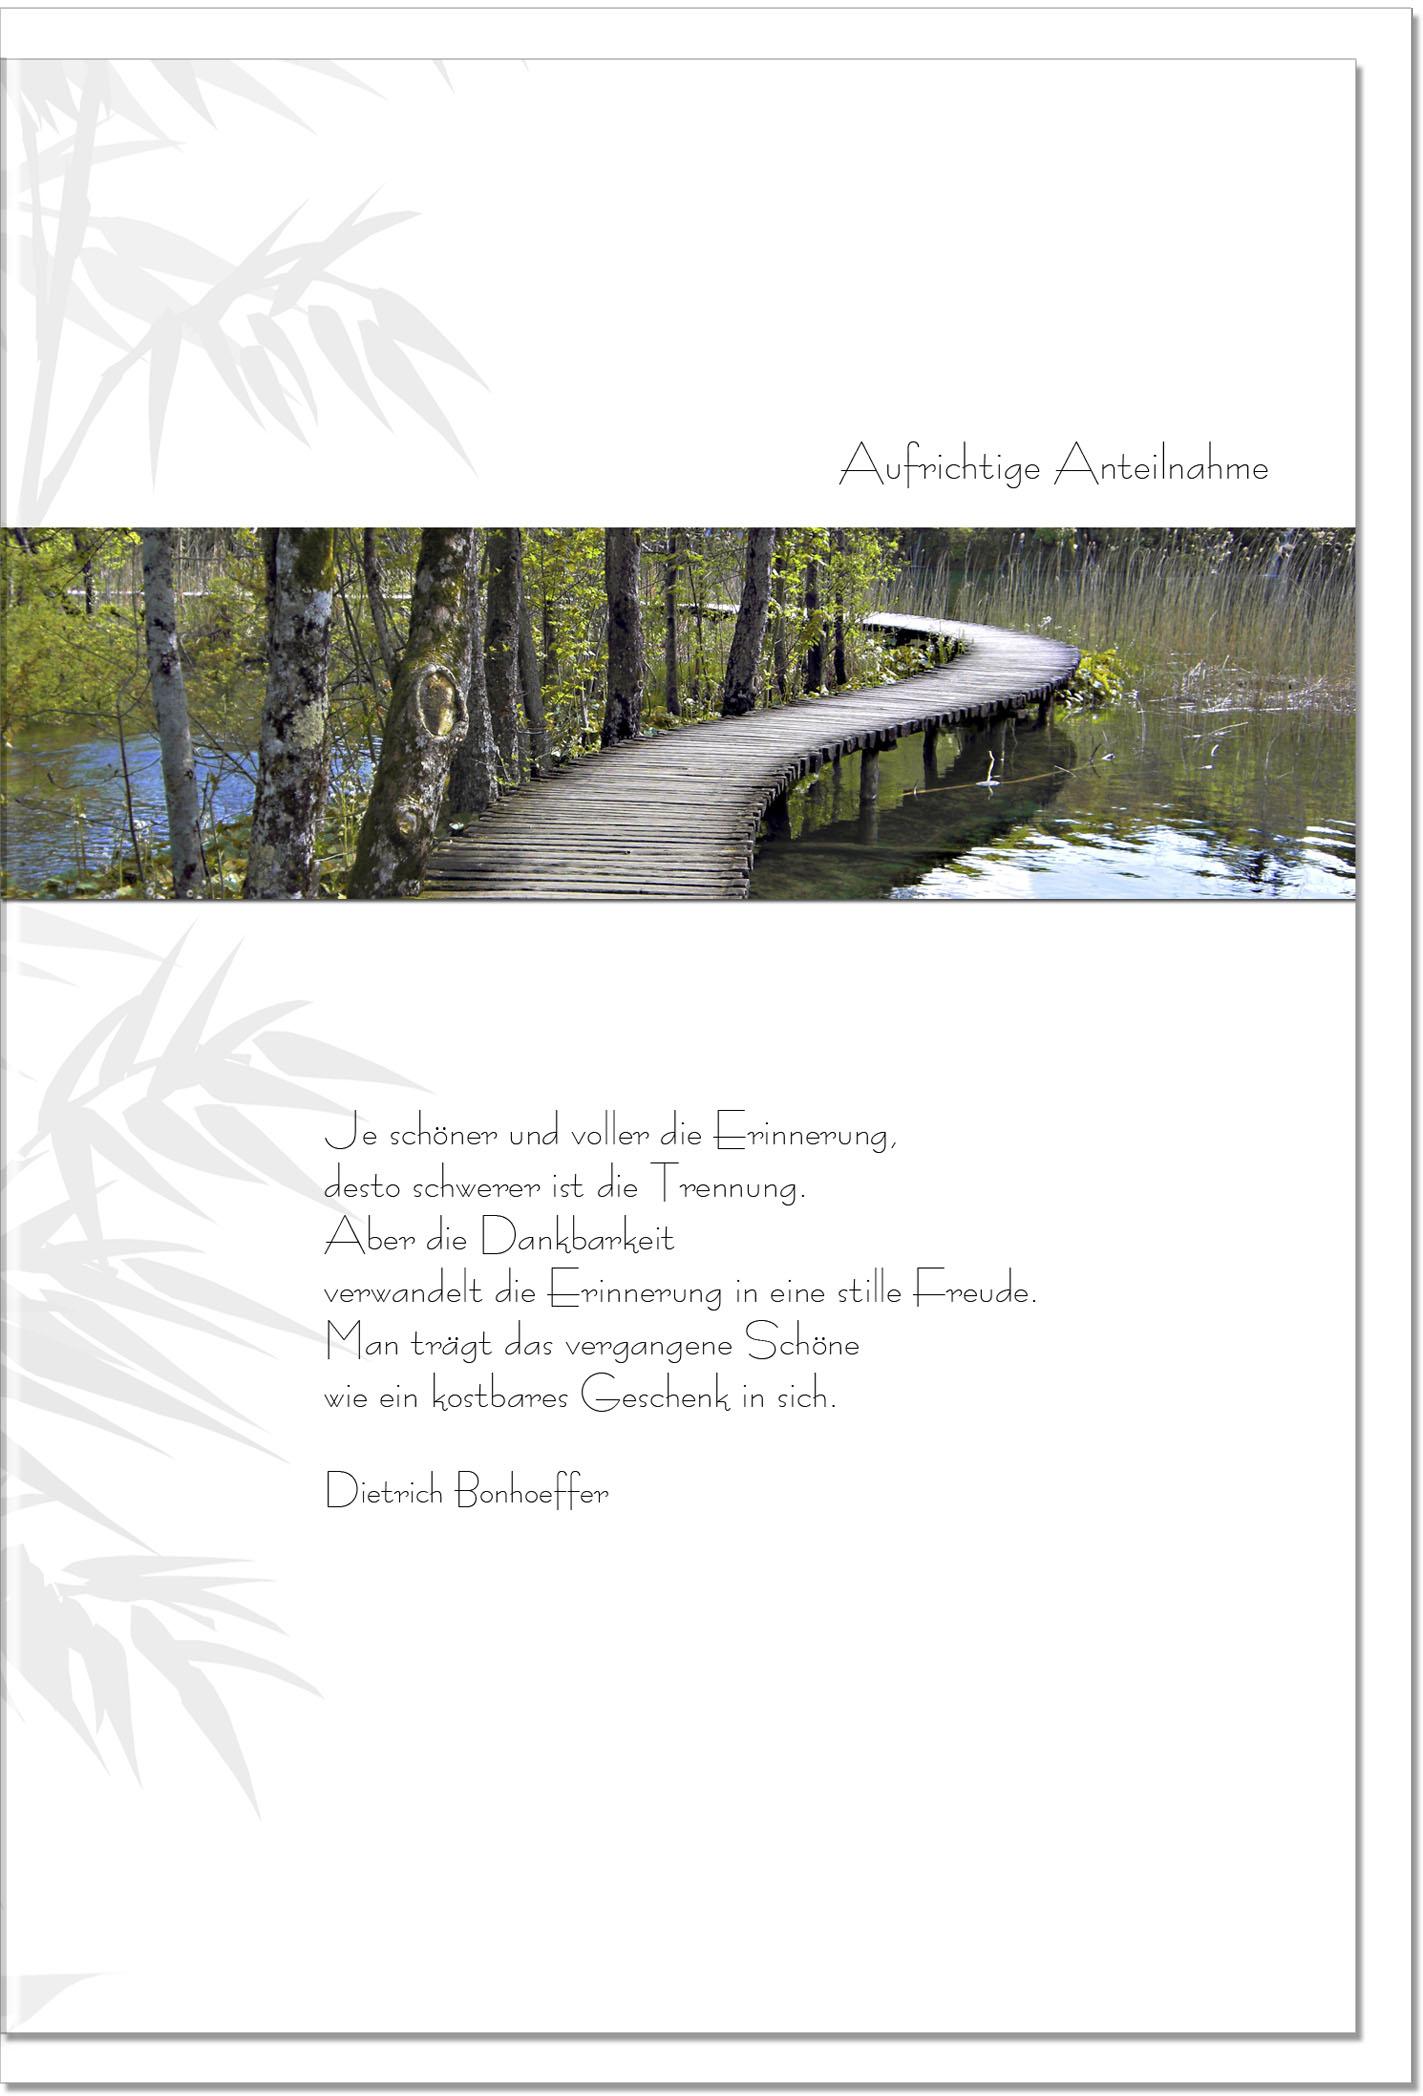 Trauerkarte ERINNERUNG | Steg | metALUm #00082